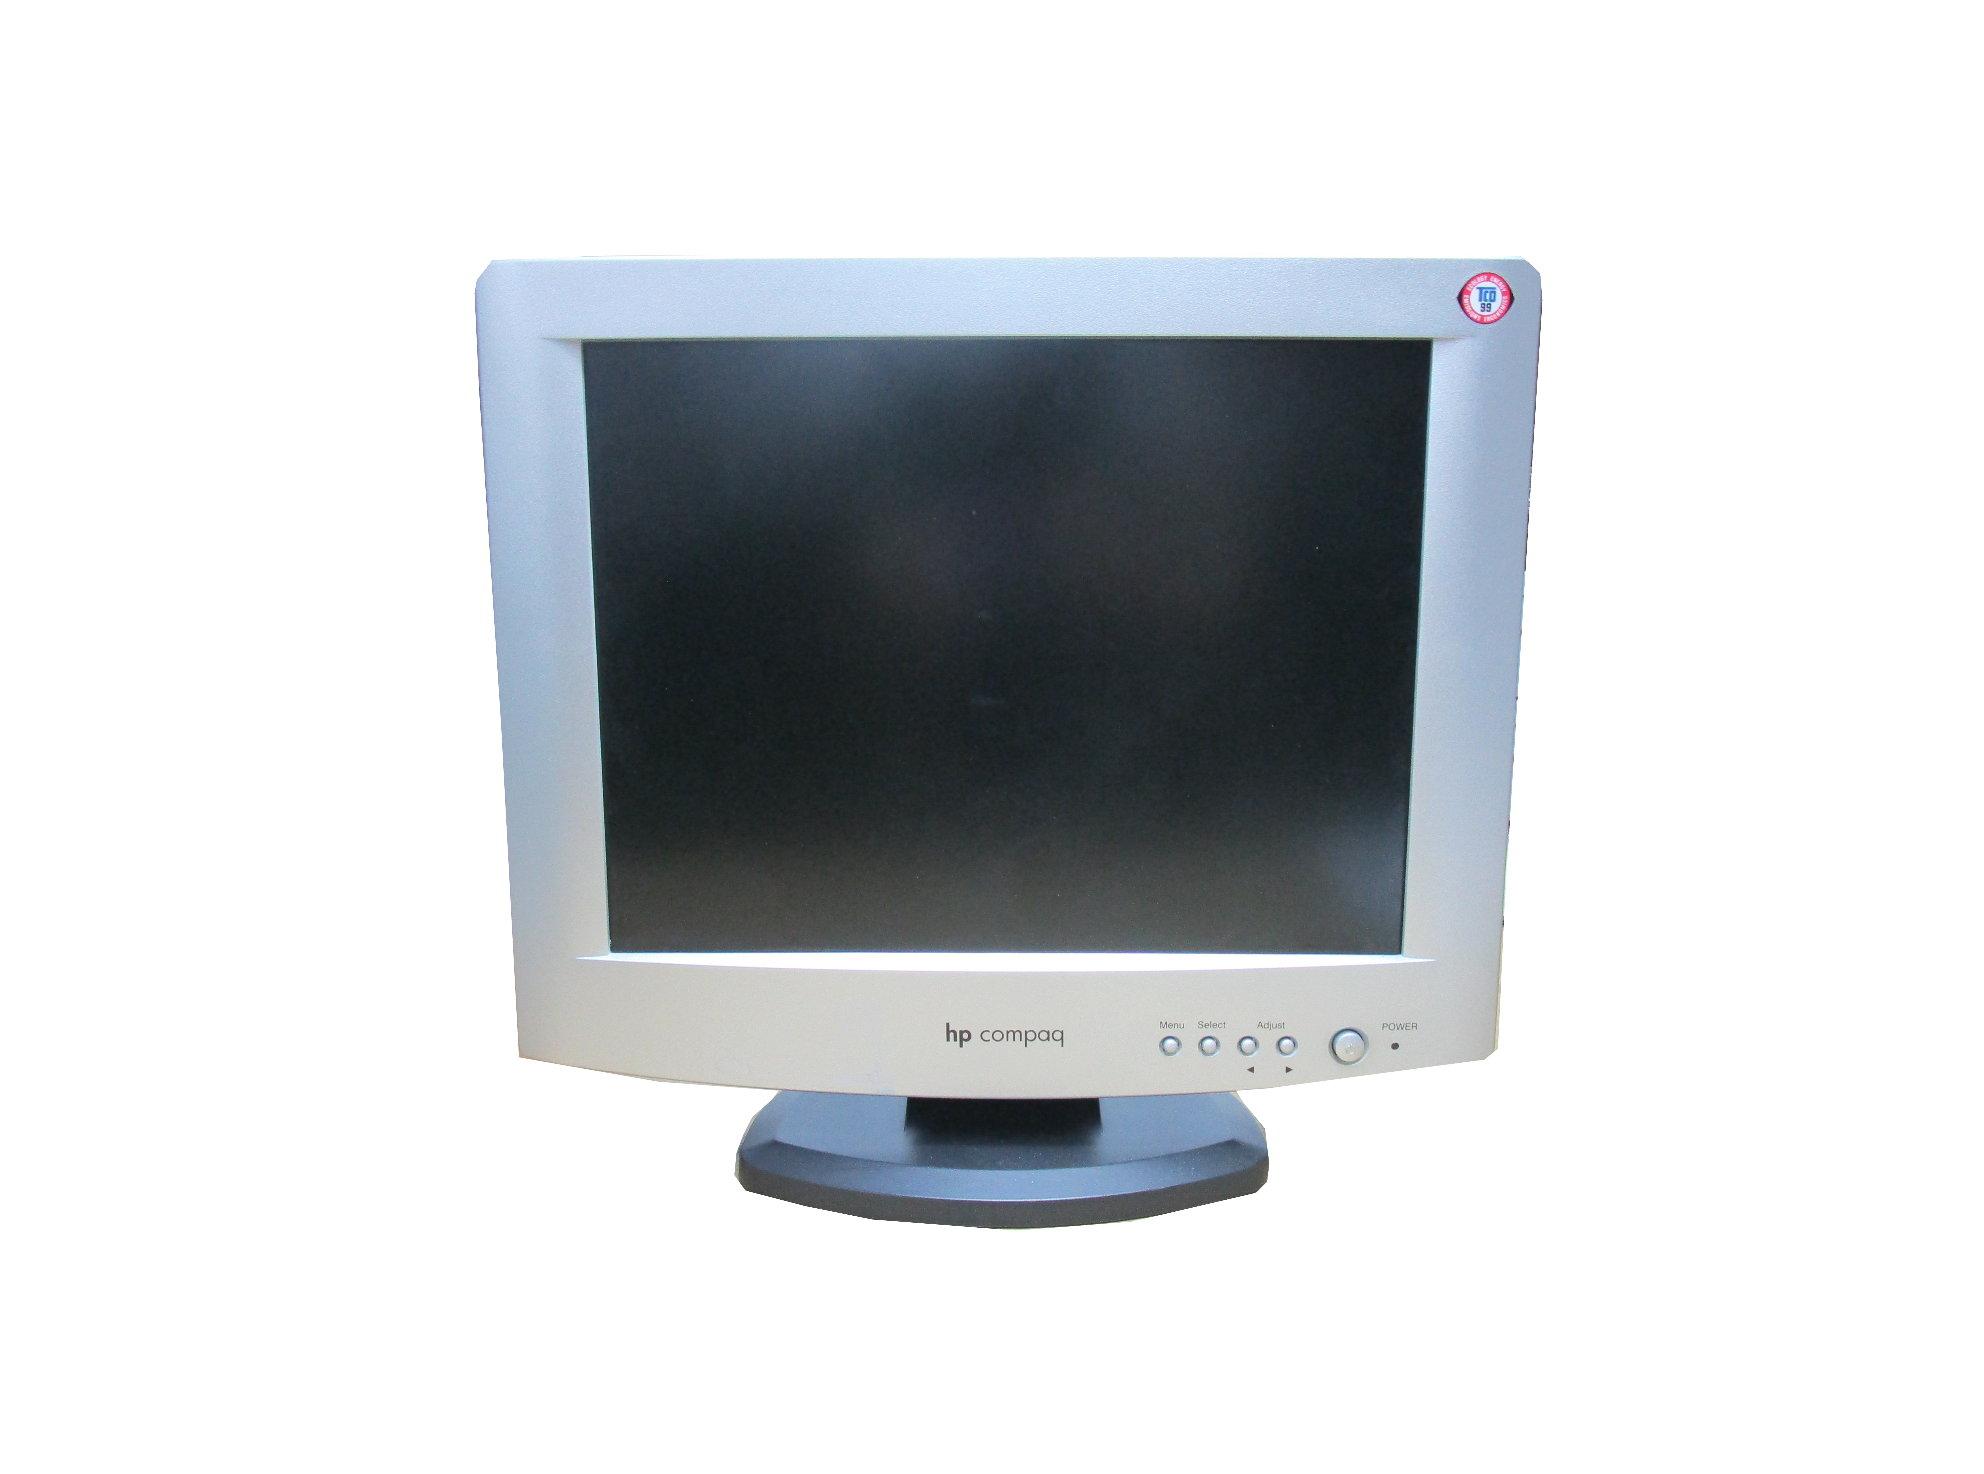 ★綠光能Outlet★ HP TFT510N PD-70FA 15吋 超薄液晶平面顯示器